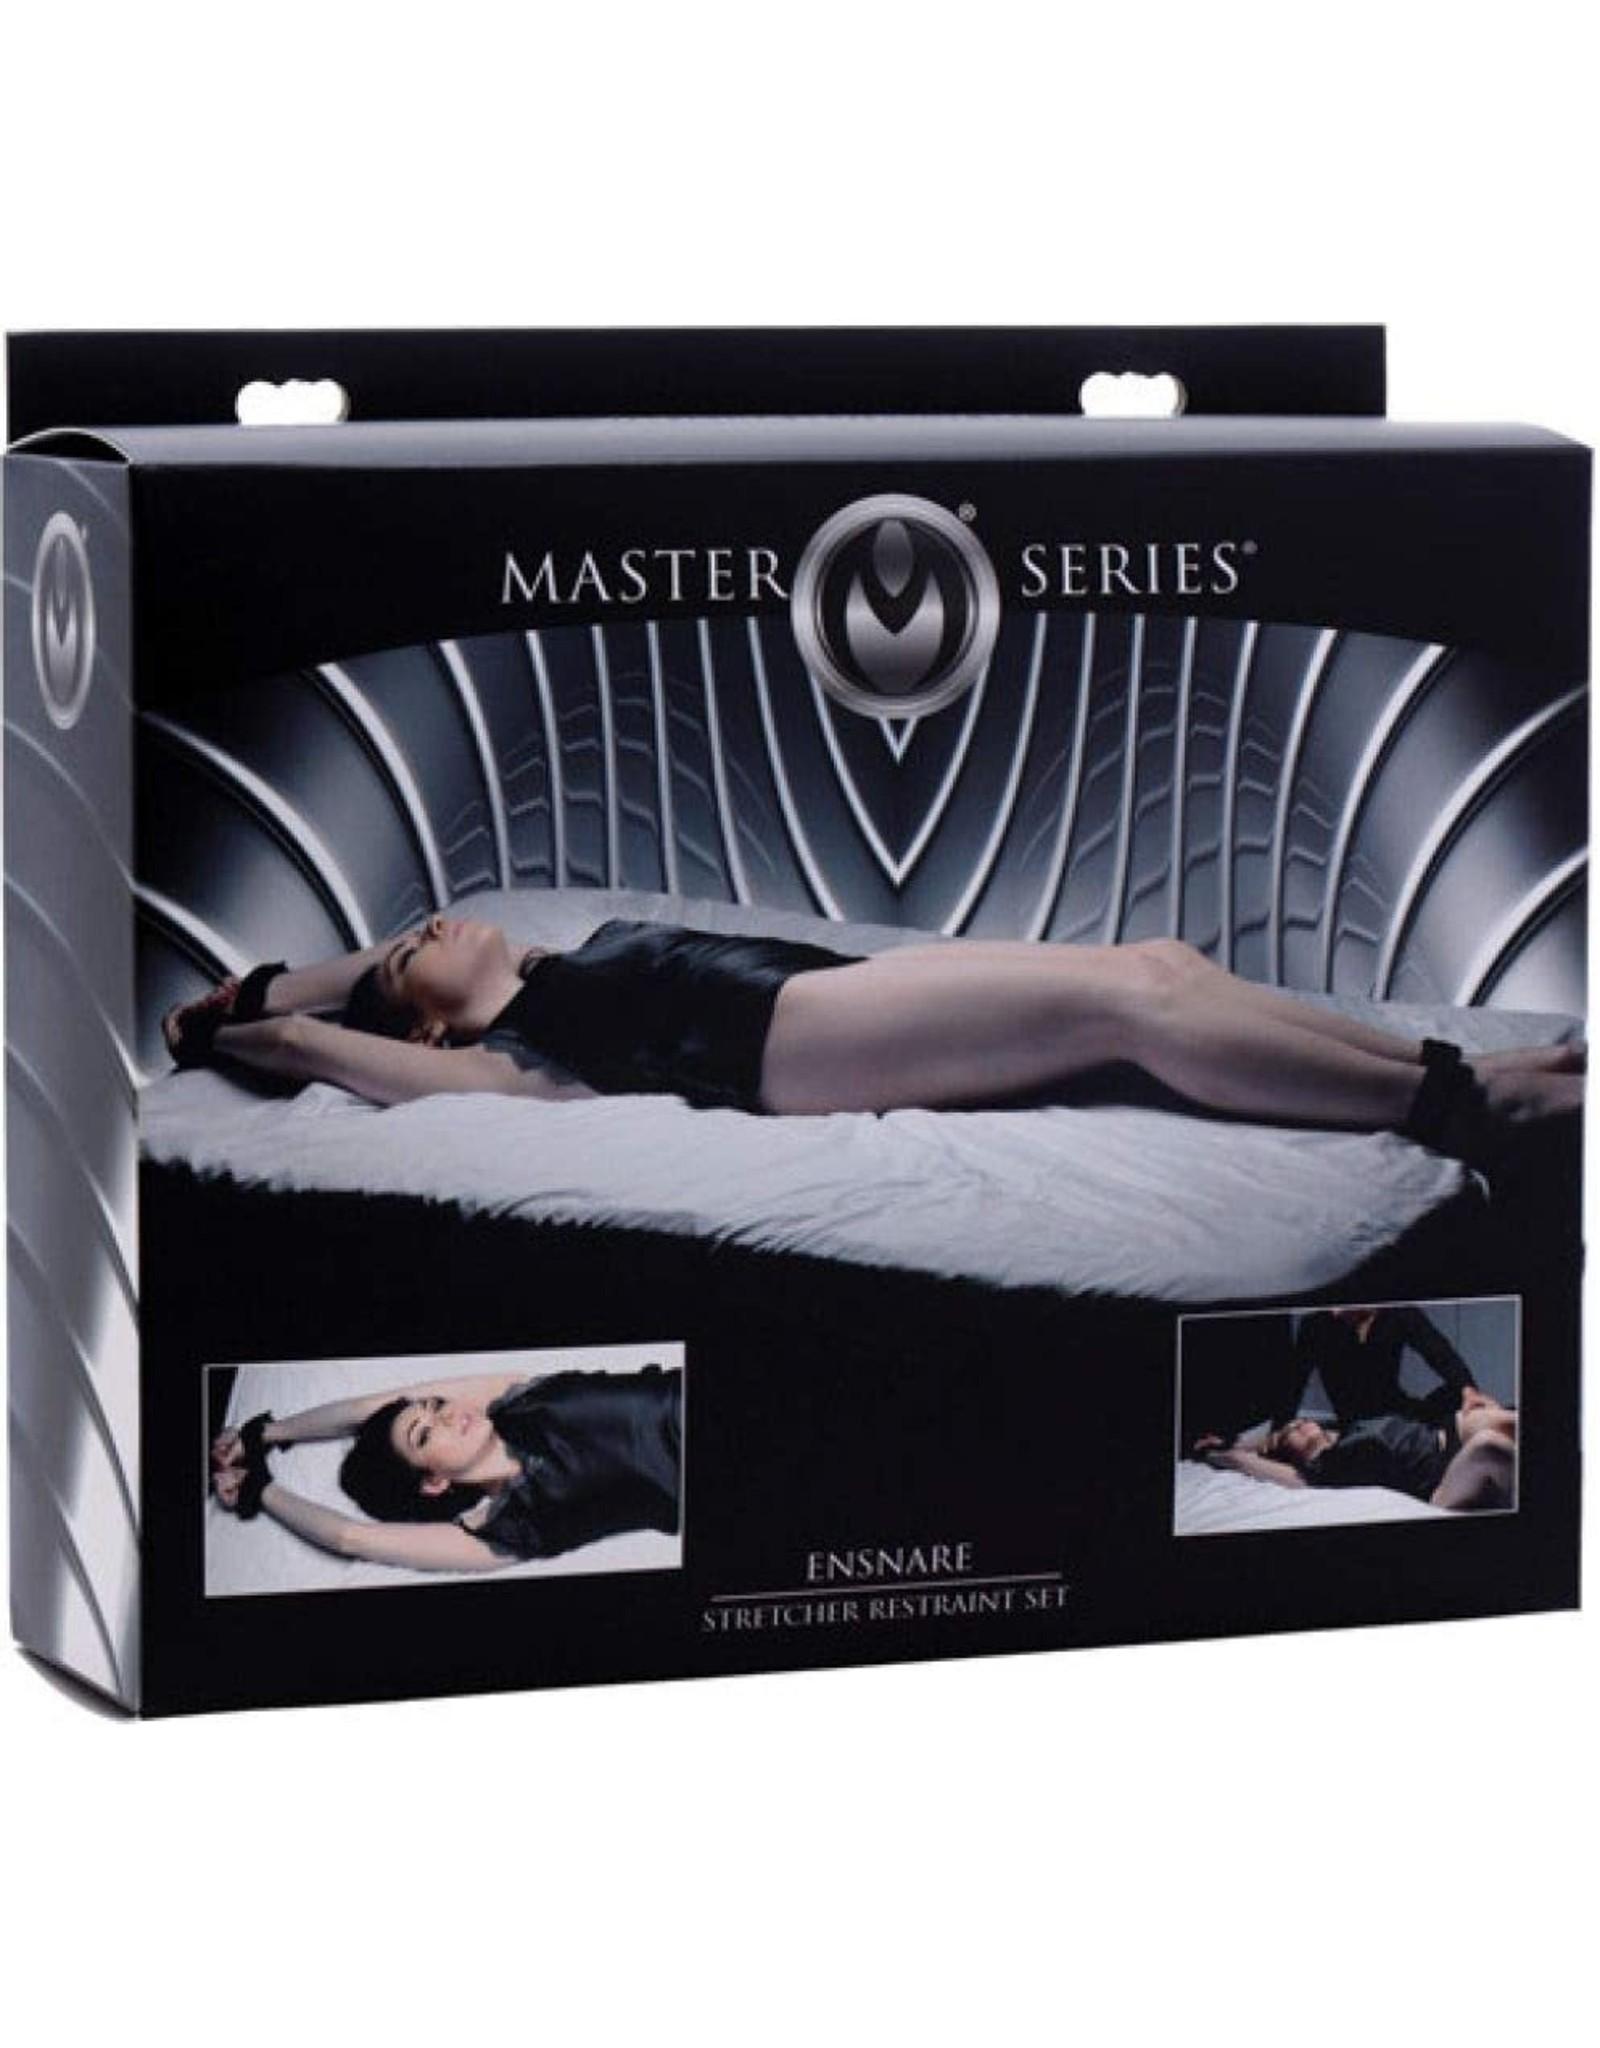 Master Series Master Series Ensnare Stretcher Restraint Set